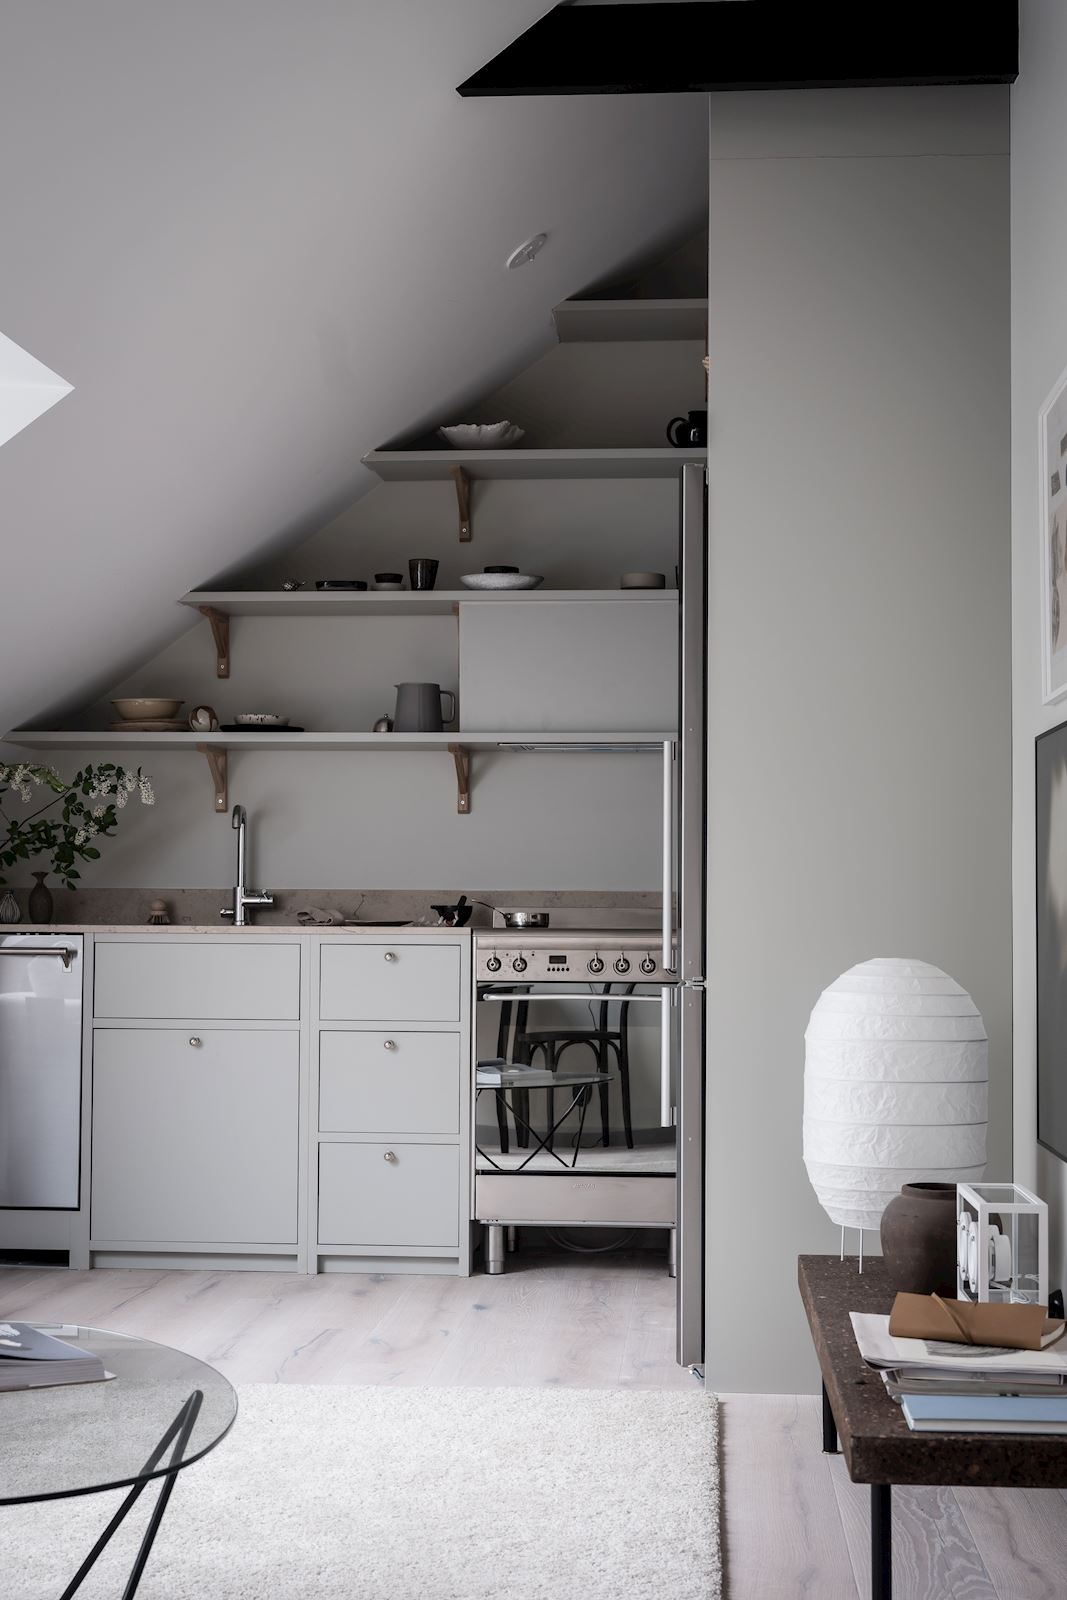 Salon z aneksem kuchennym w stylu skandynawskim